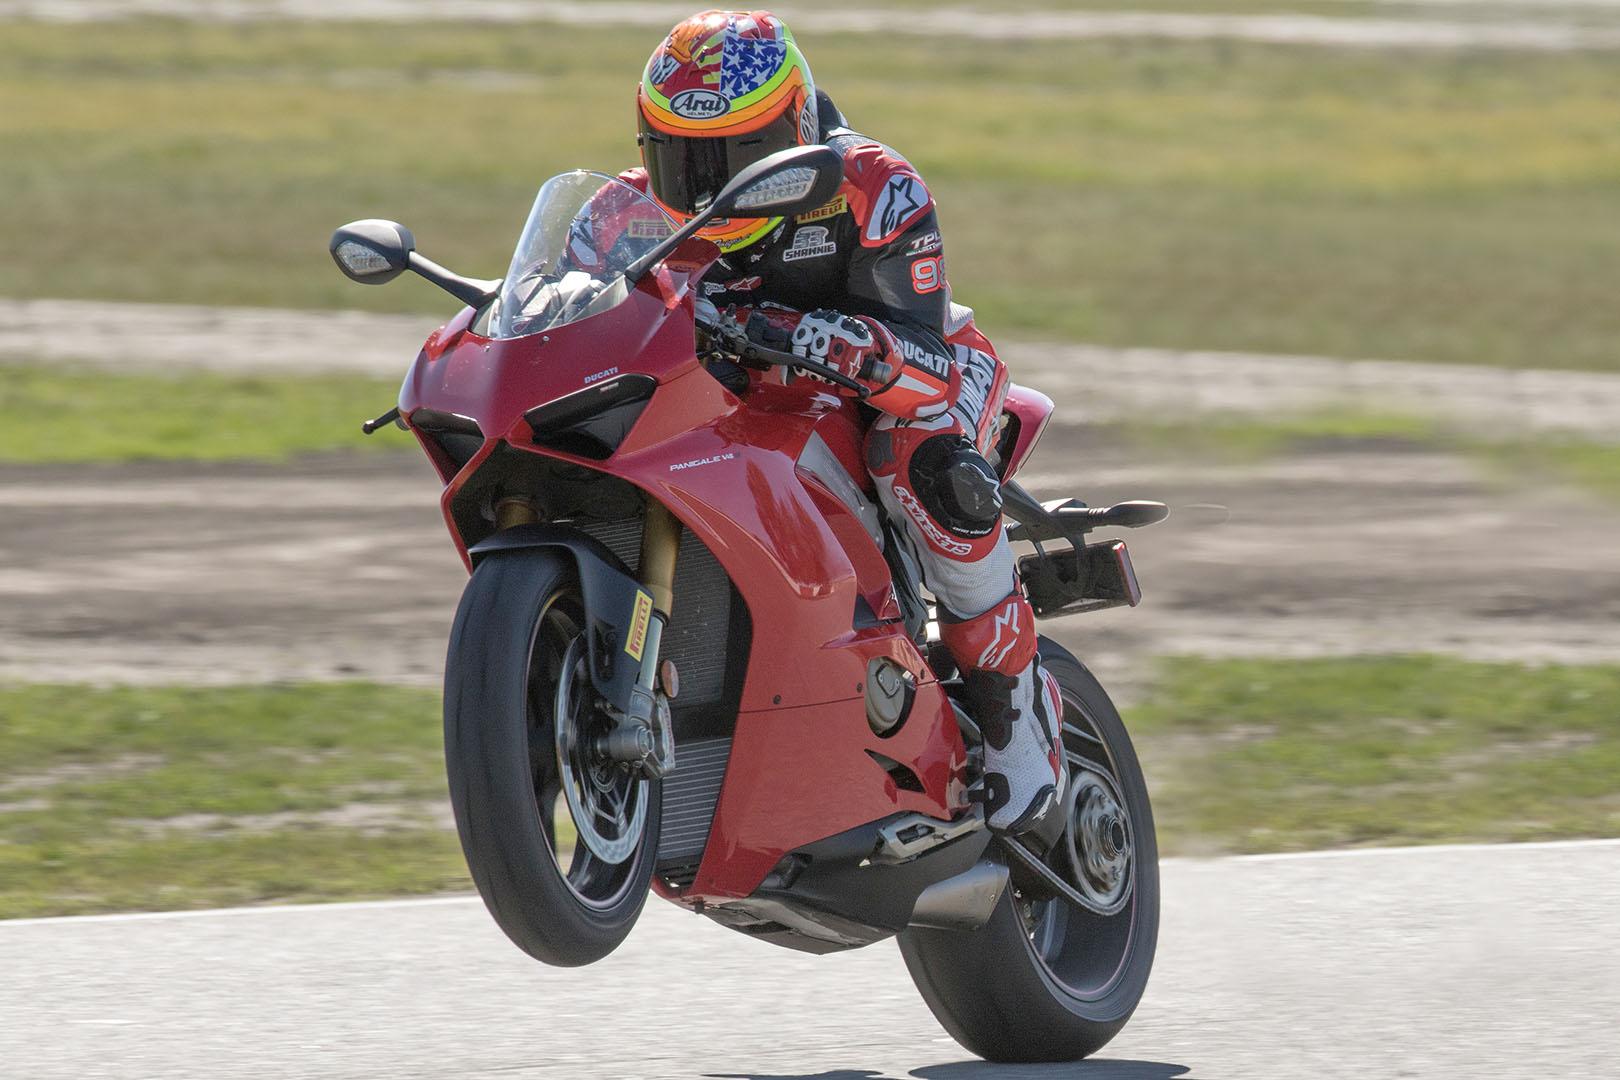 Pirelli Diablo Supercorsa TD Track Tire - Jake Zemke Ducati